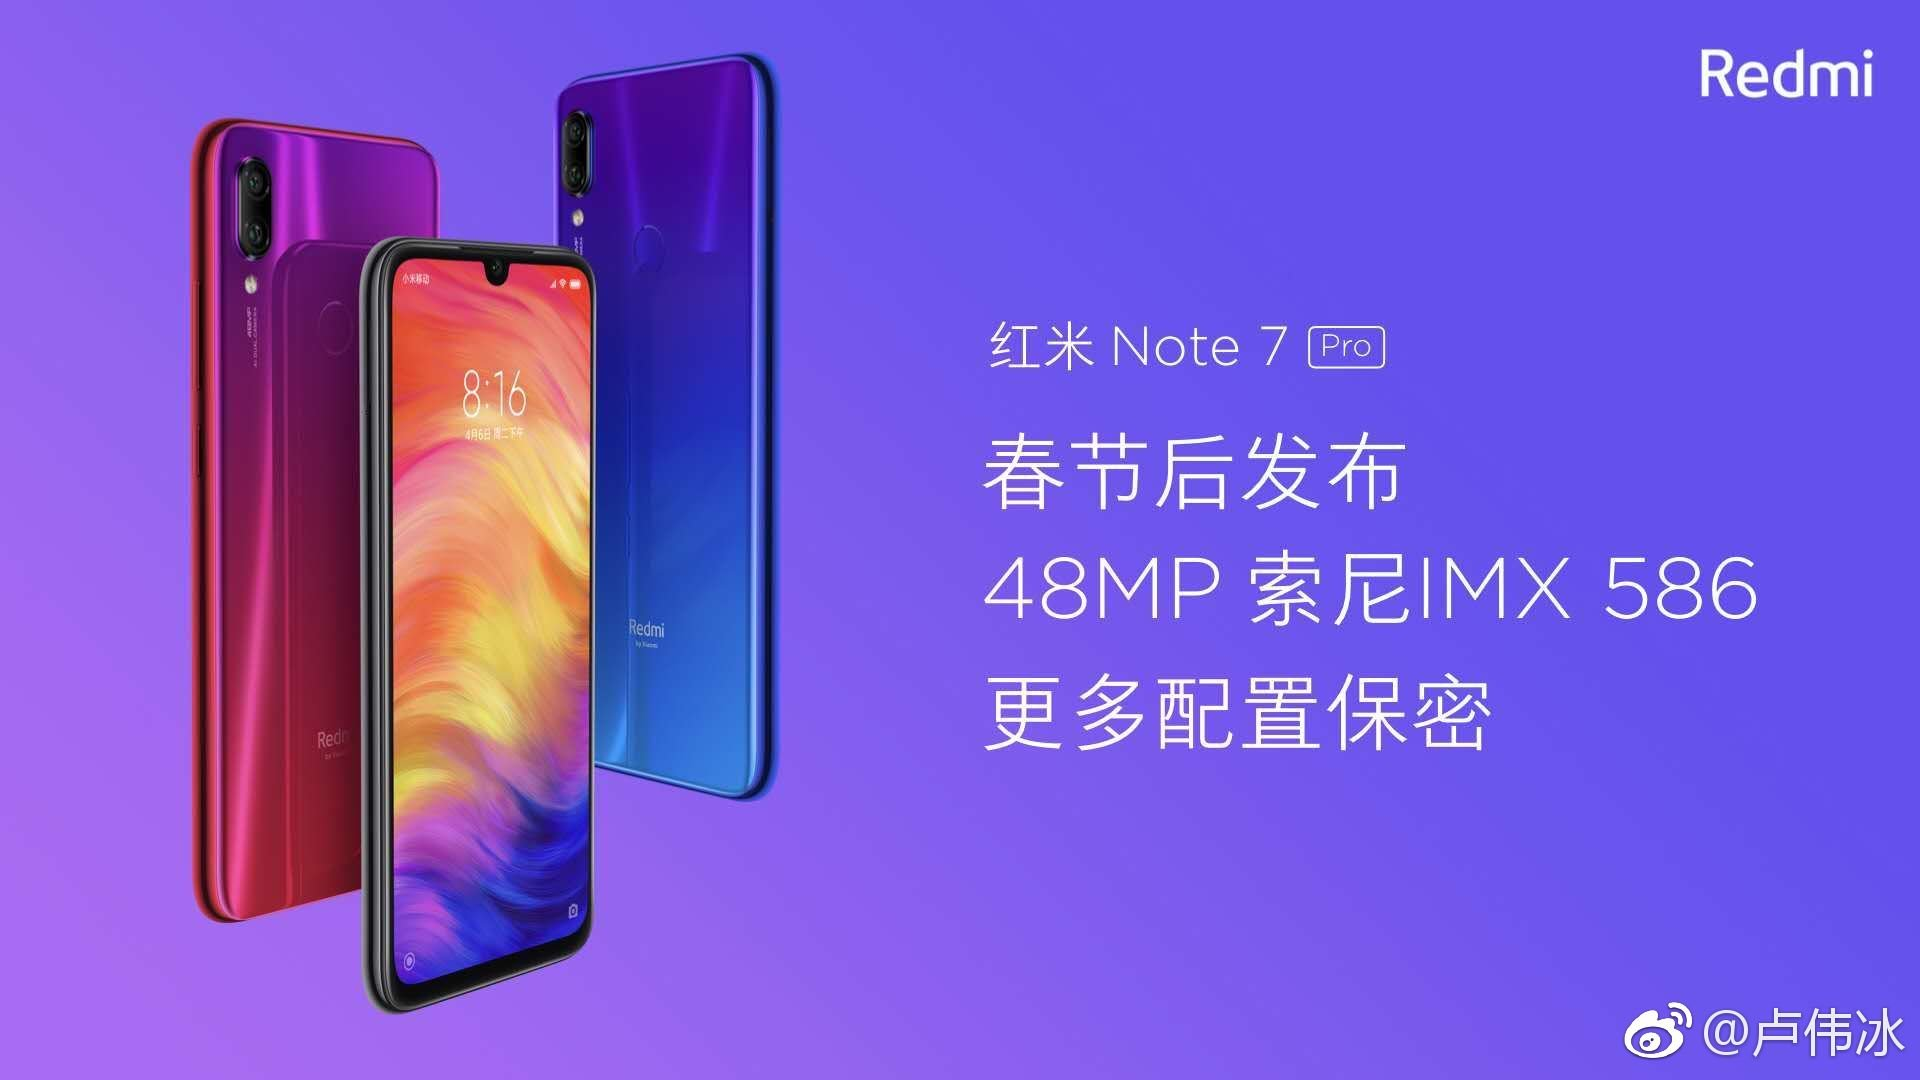 Redmi Note 7 Pro vs Redmi Note 7 - where do you want to Upgrade - Lu Weibing 2